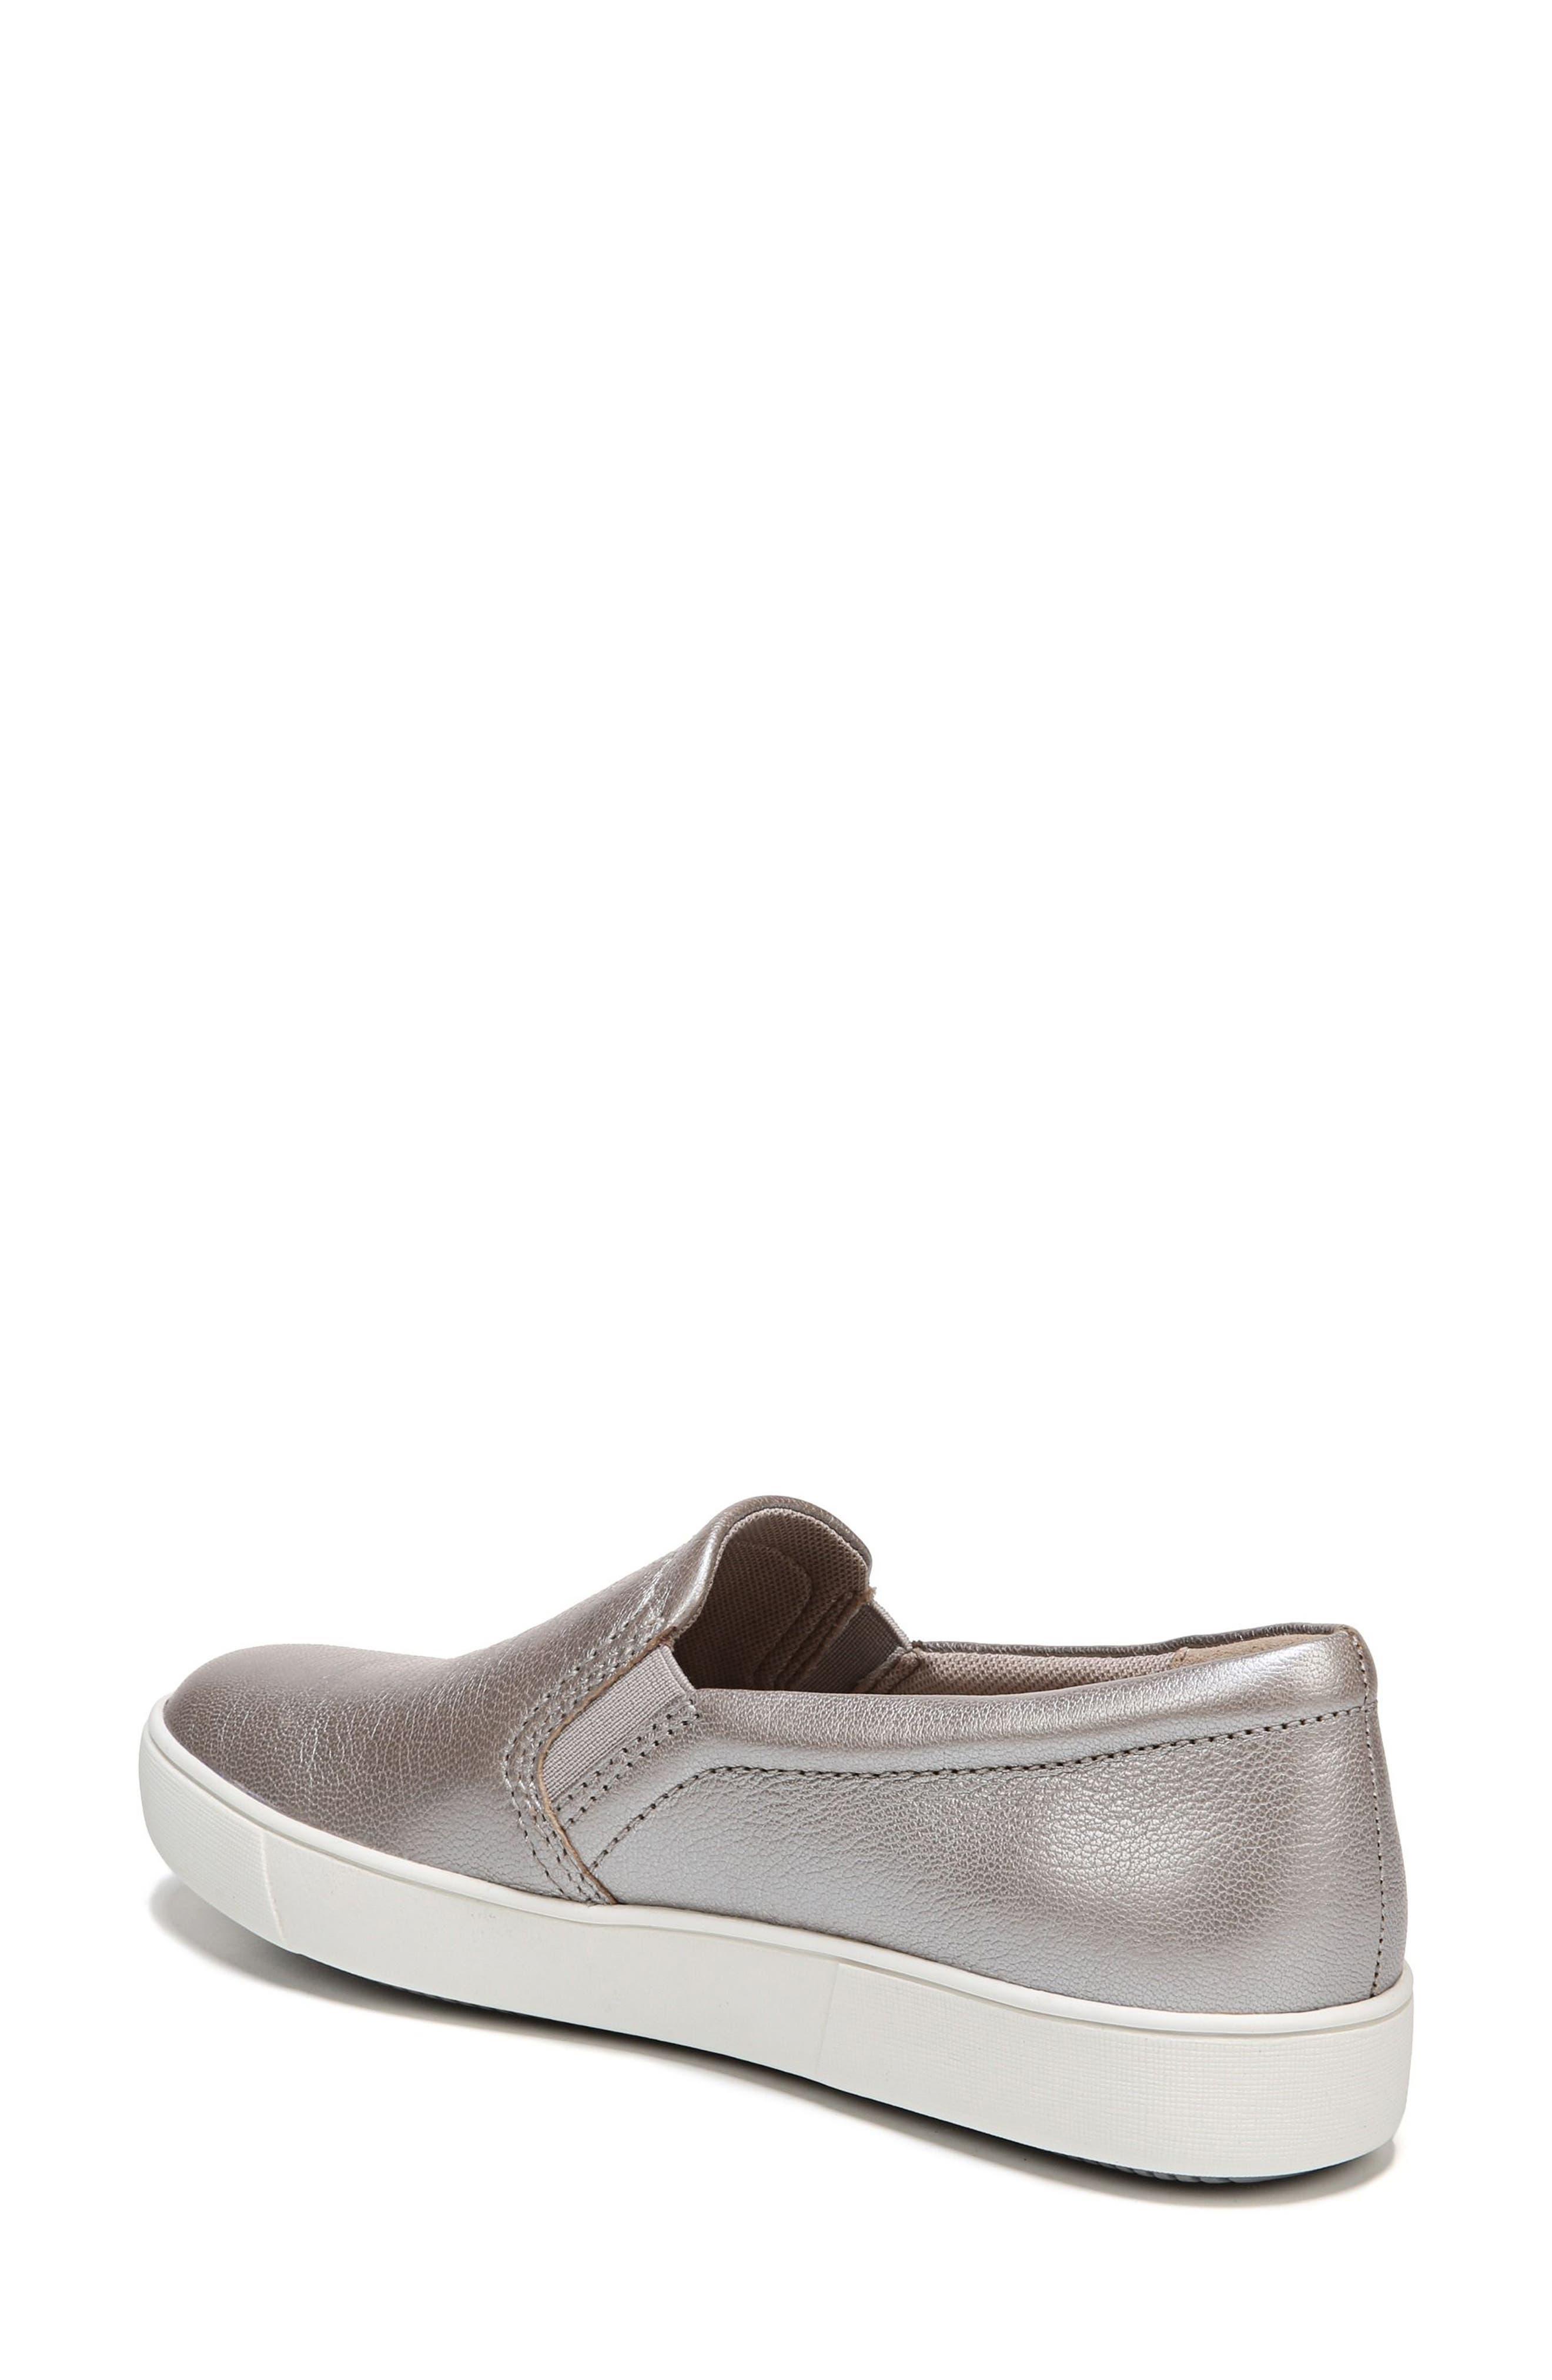 Marianne Slip-On Sneaker,                             Alternate thumbnail 2, color,                             SILVER LEATHER